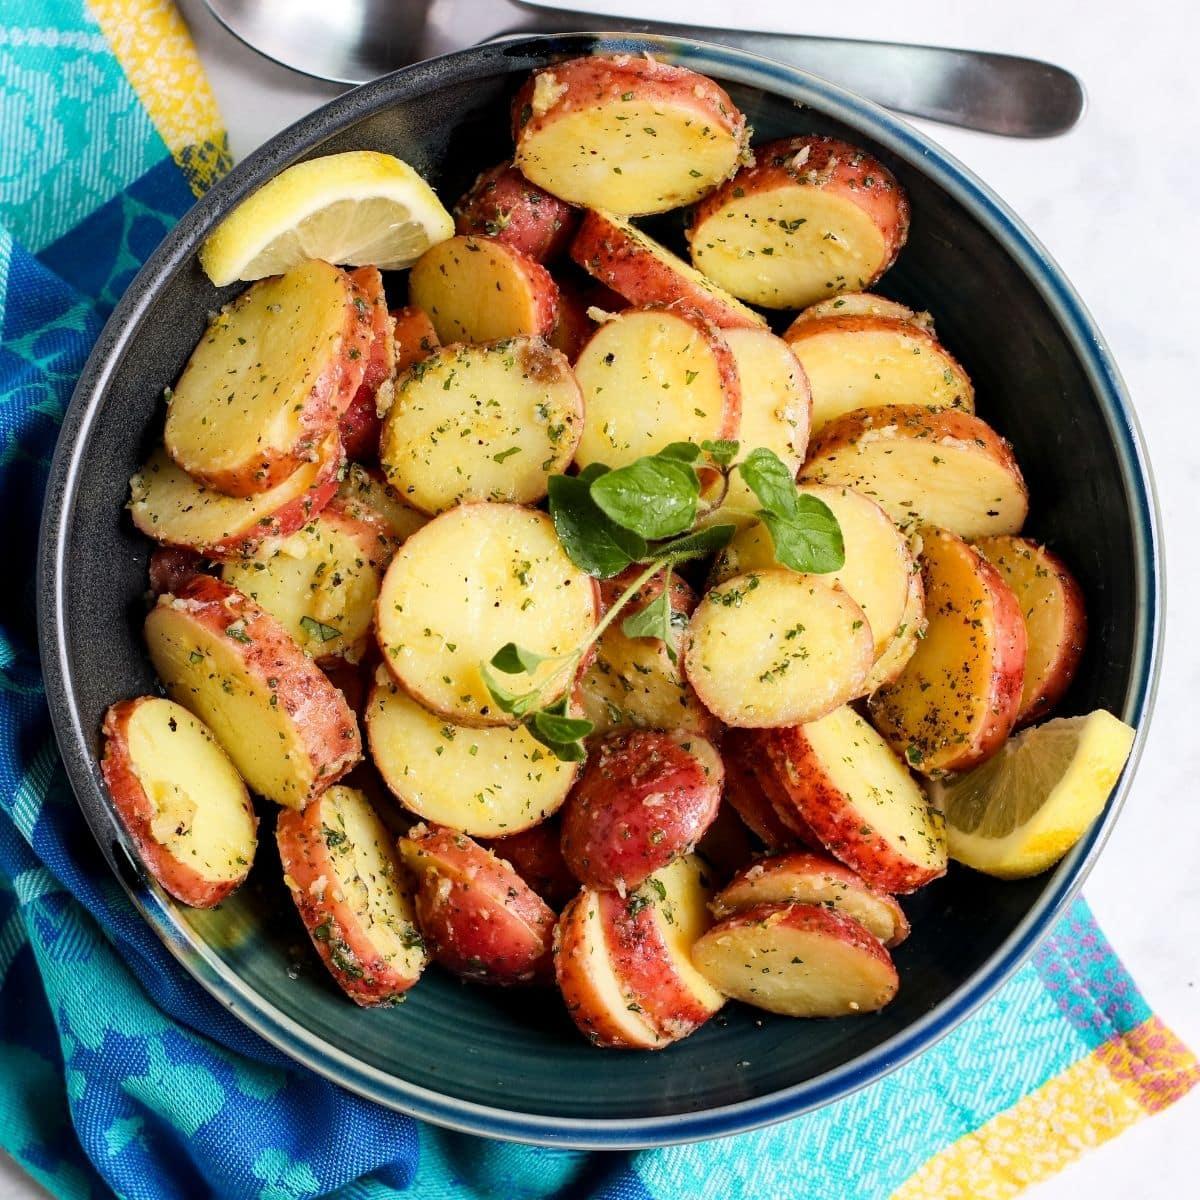 Bowl of Greek potato salad garnished with a sprig of fresh oregano